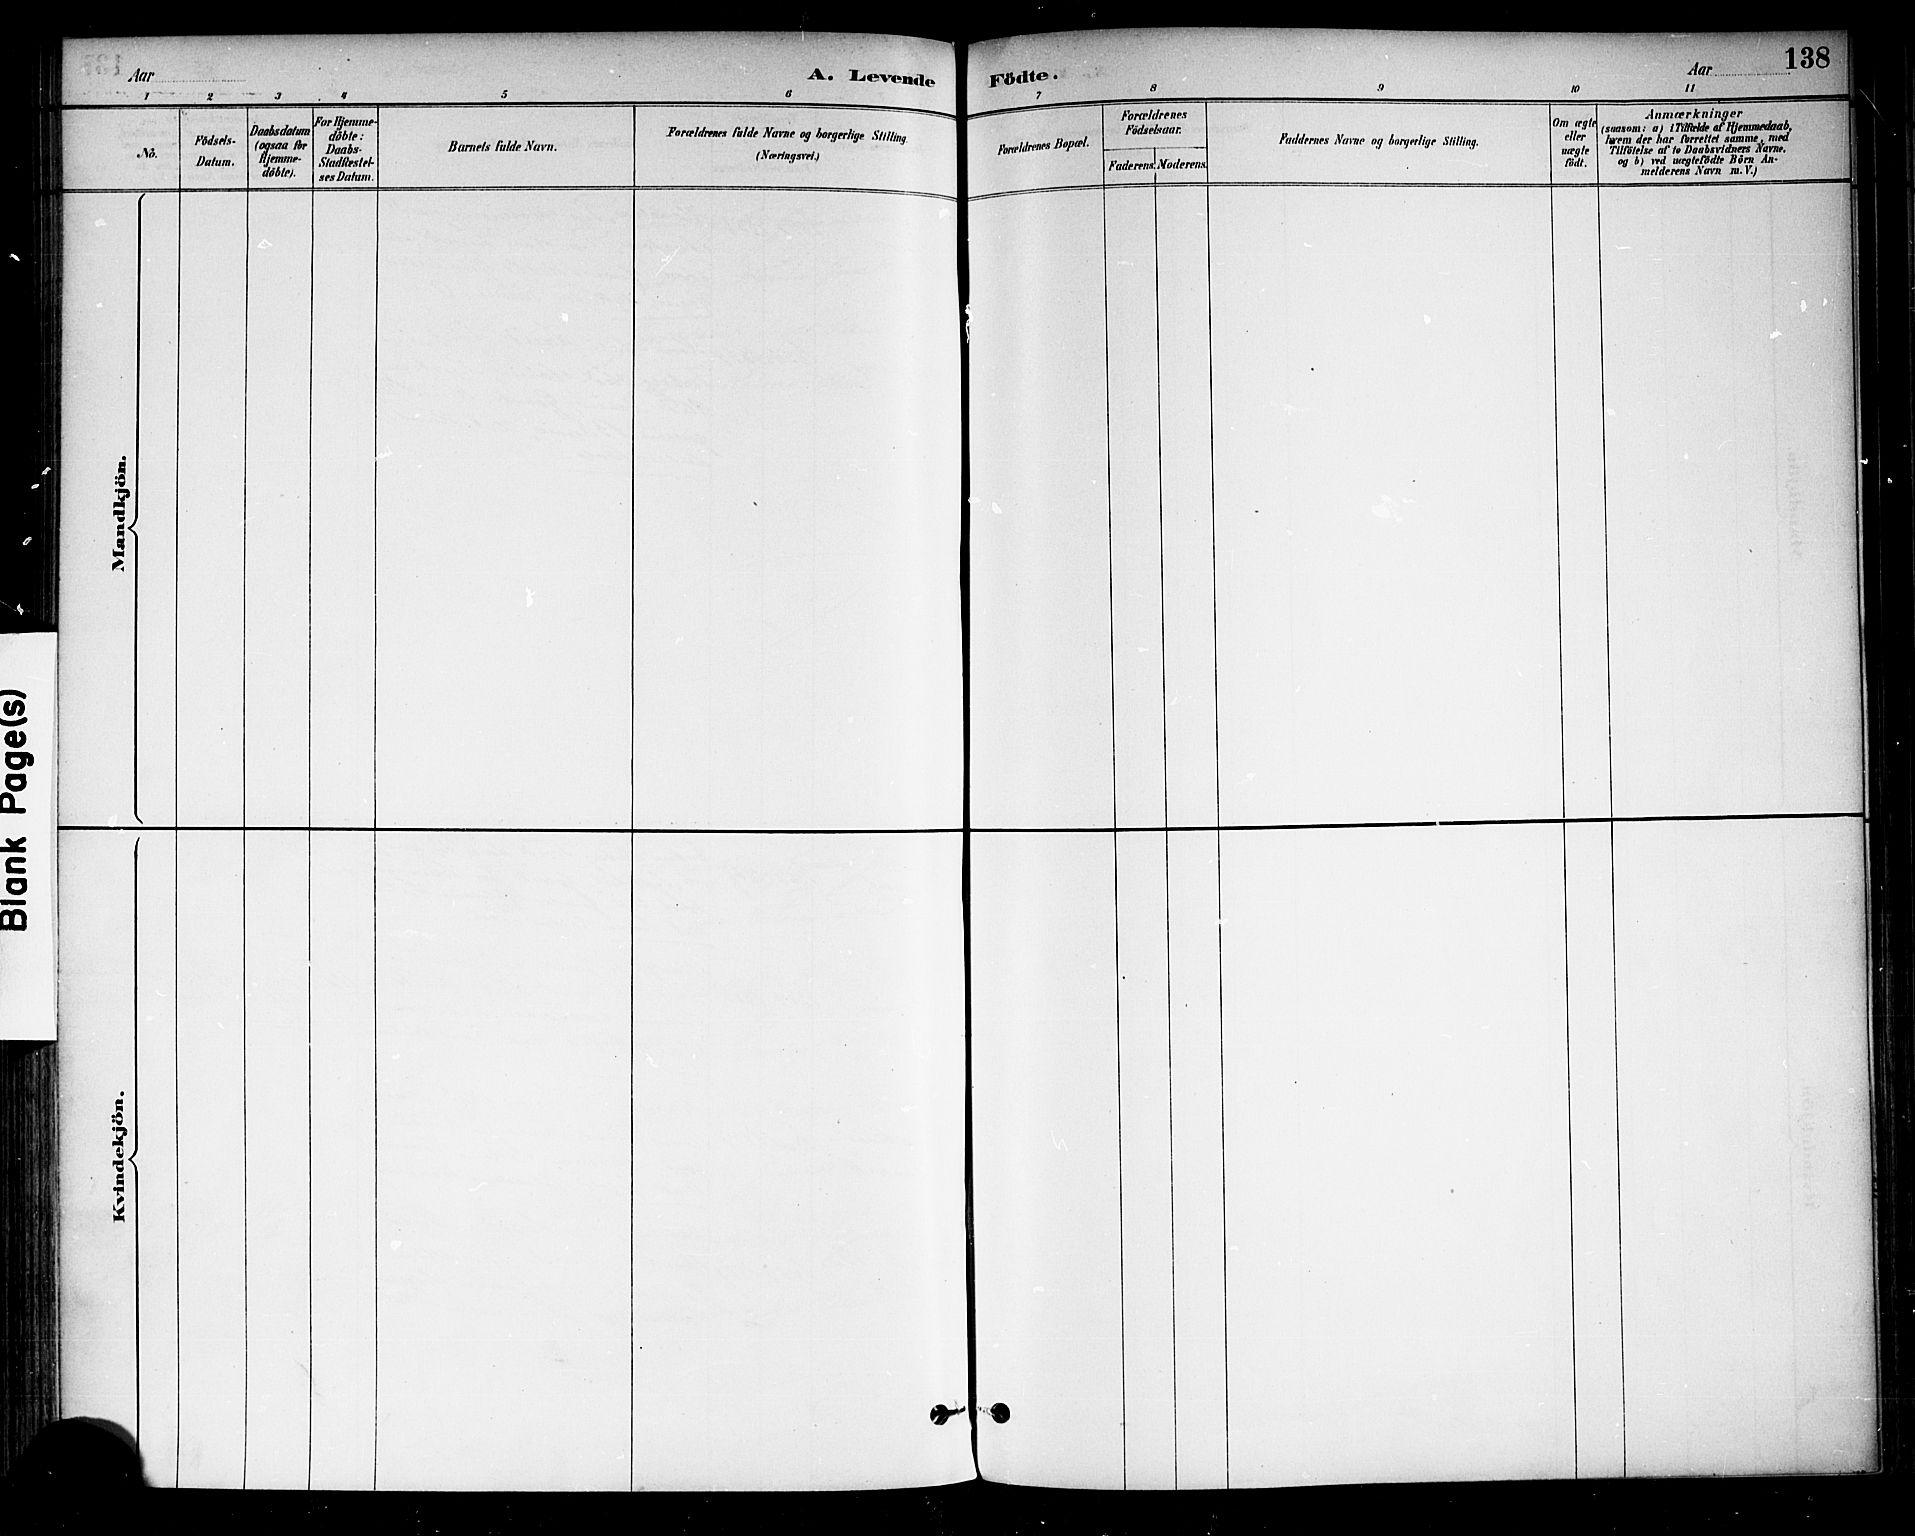 SAKO, Drangedal kirkebøker, F/Fa/L0010: Ministerialbok nr. 10 /1, 1885-1894, s. 138